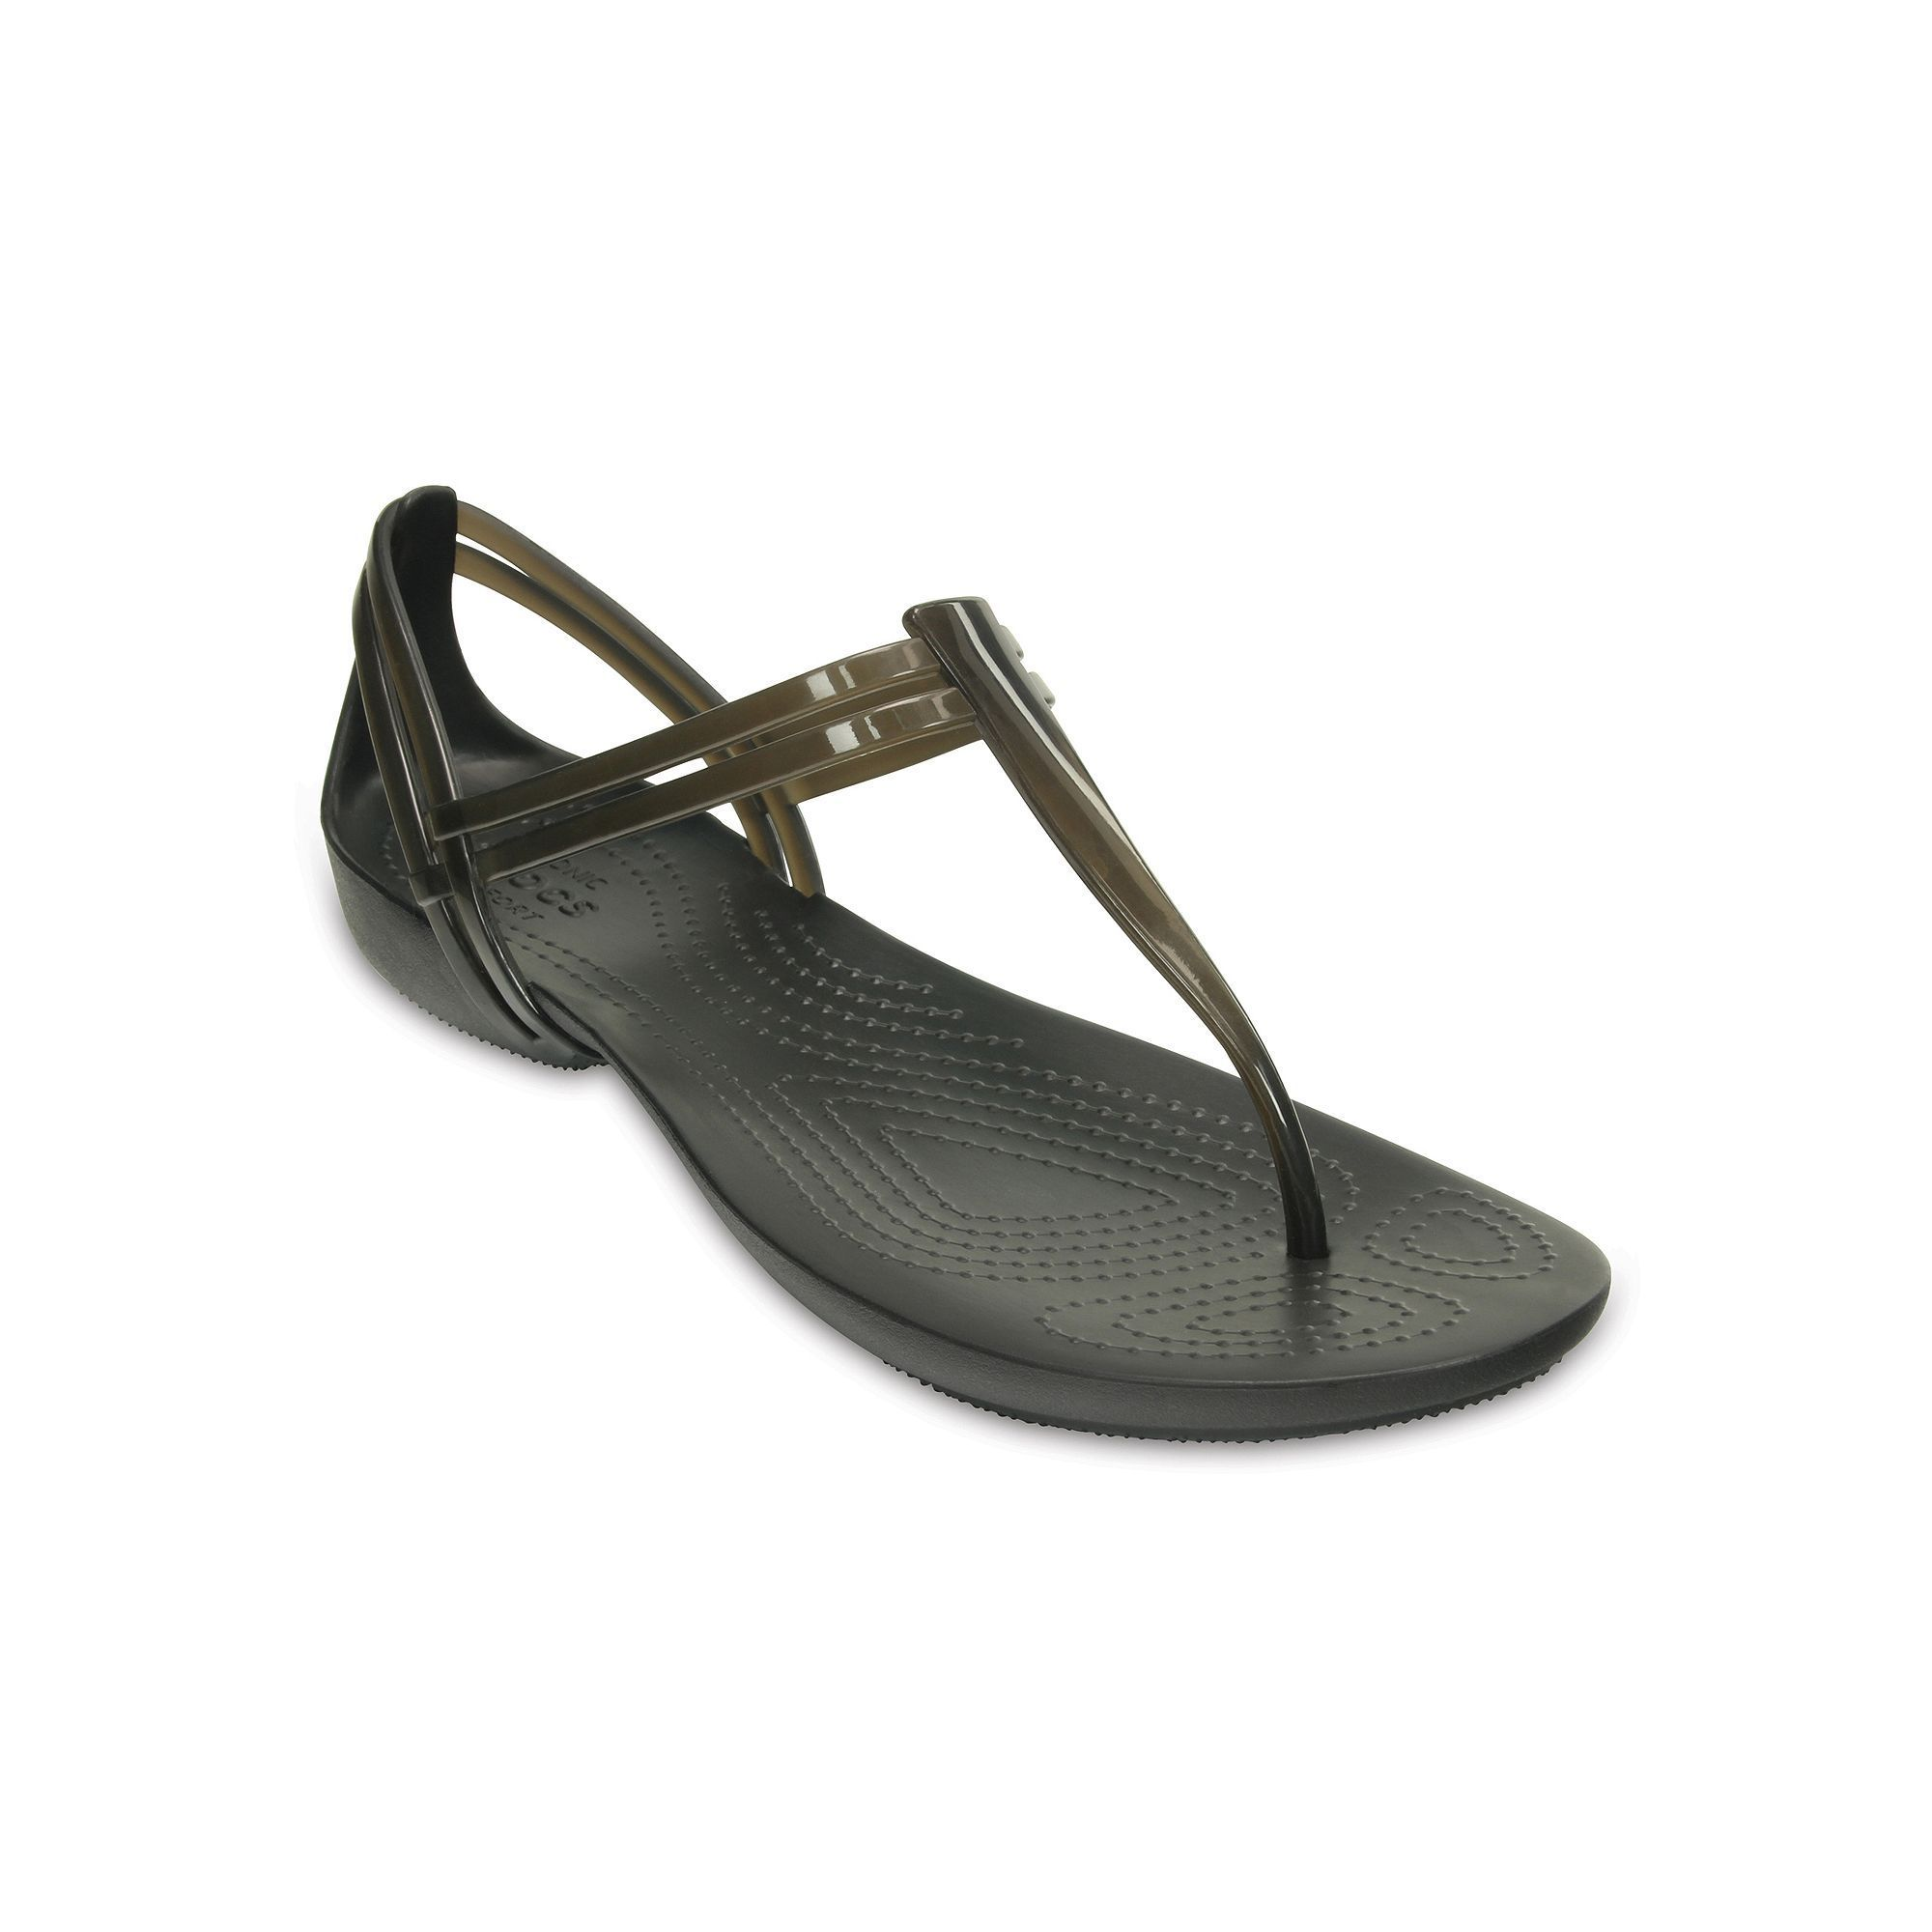 e9f3a4daf8933 Crocs Isabella Women s T-Strap Sandals